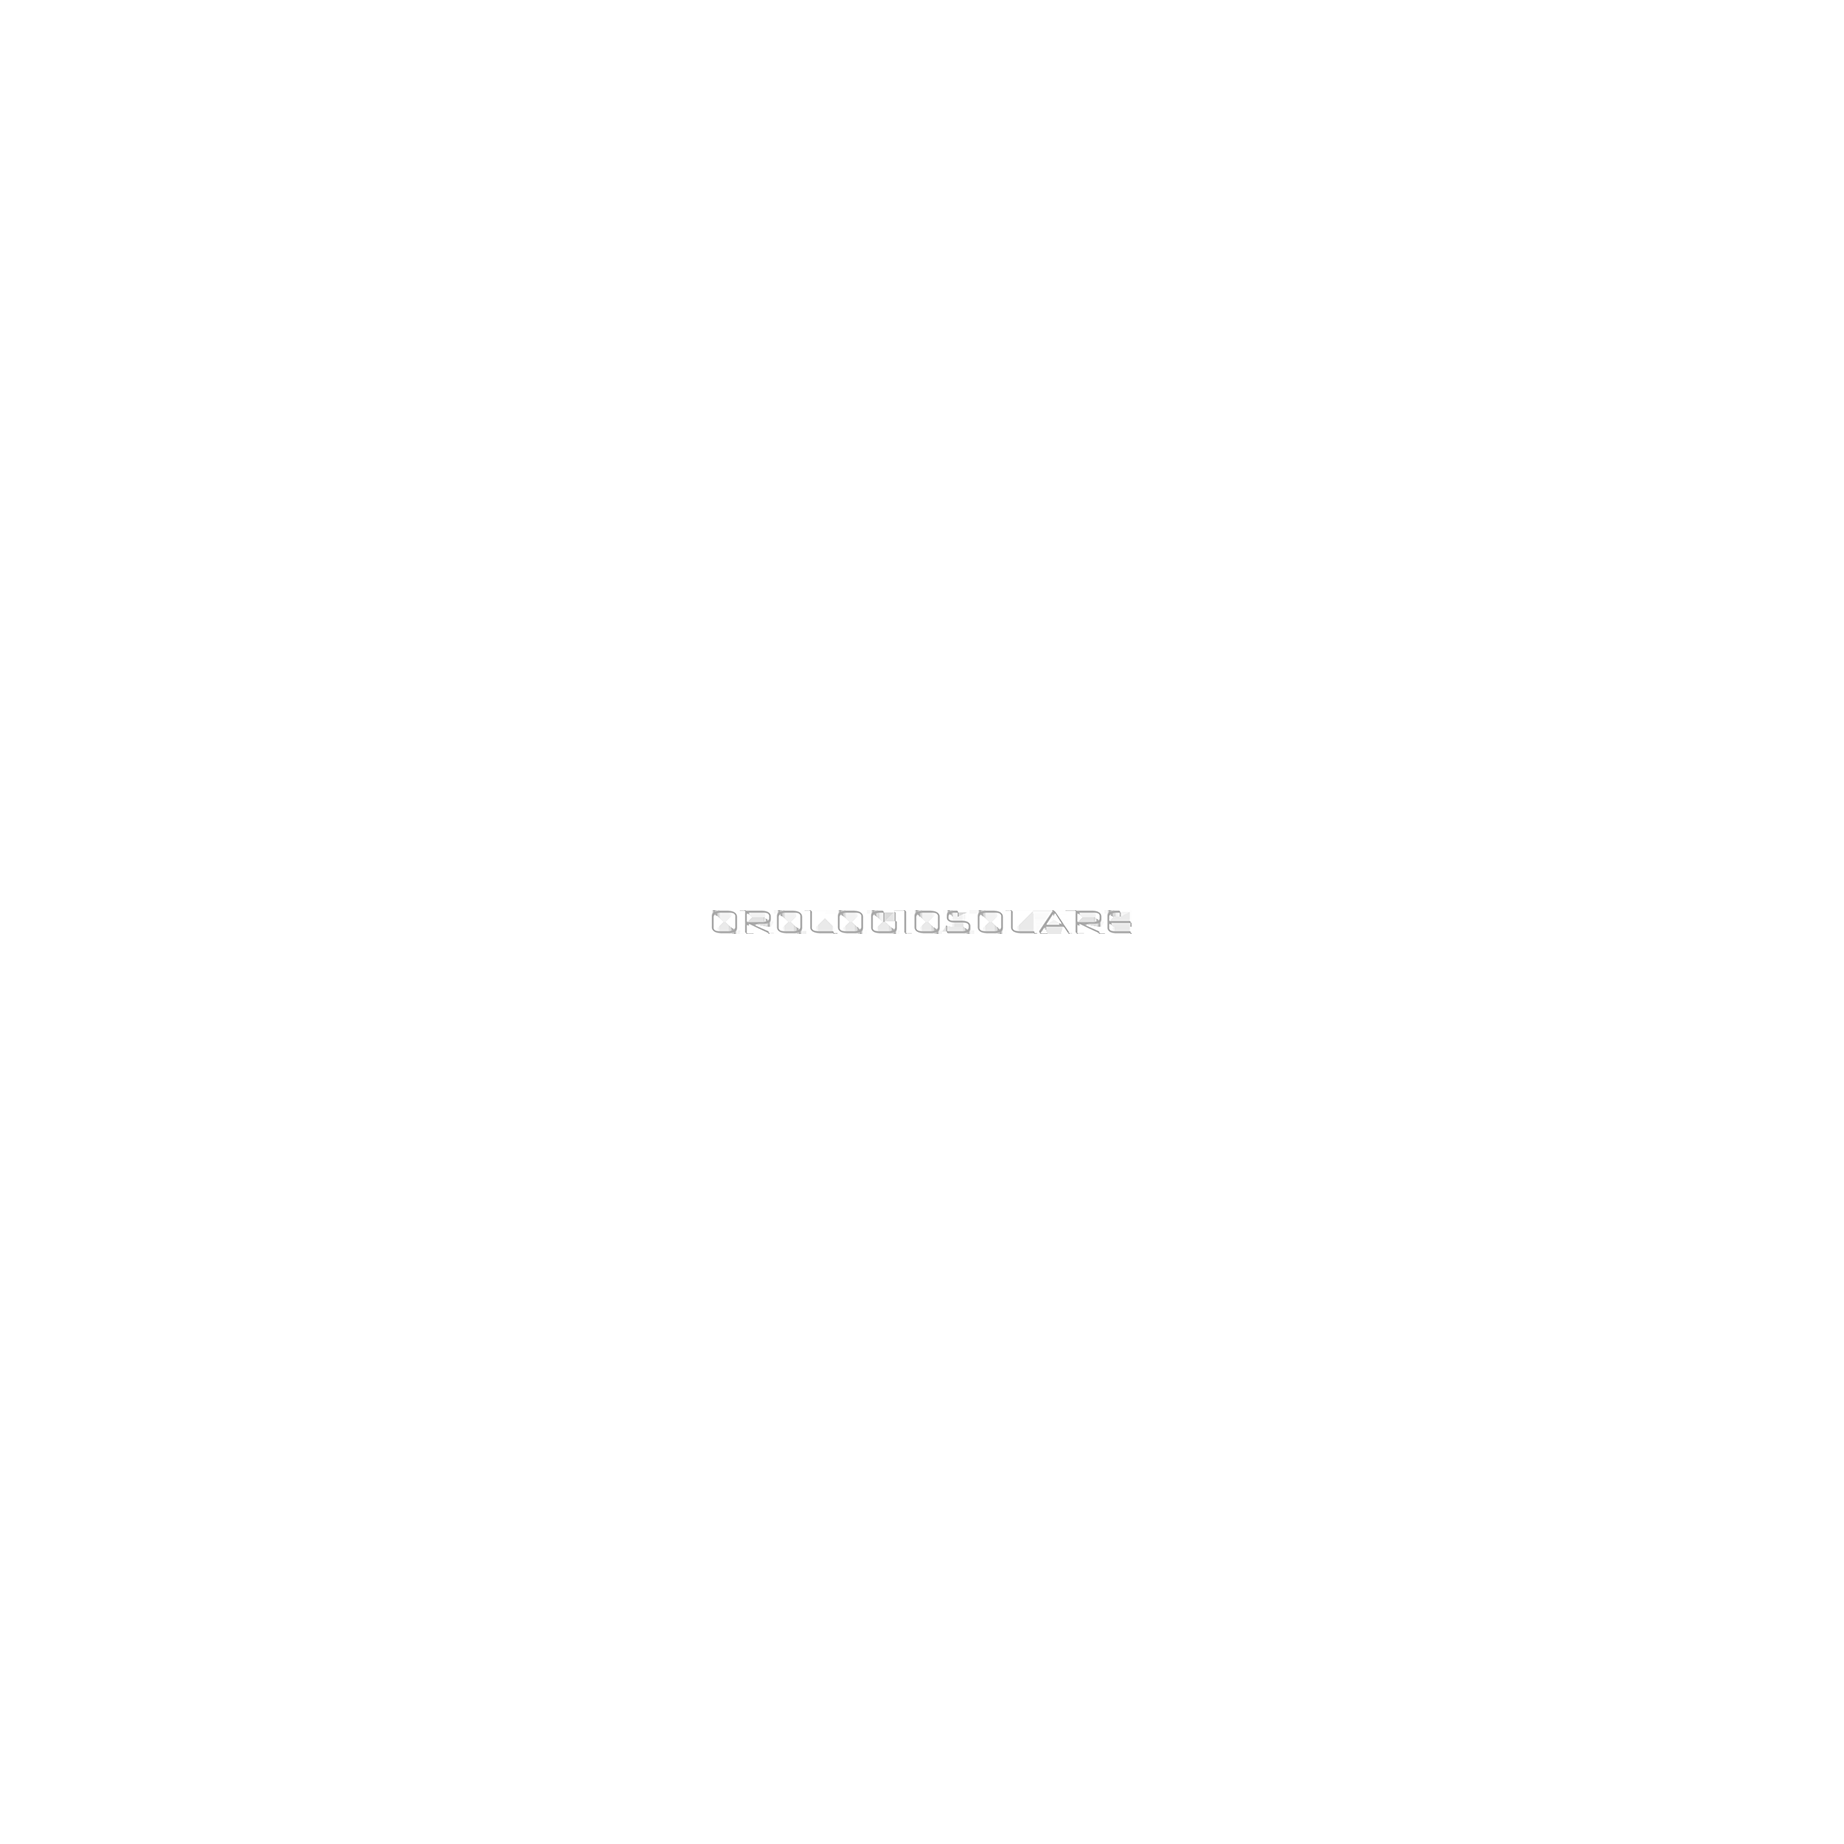 logo OROLOGIOSOLARE